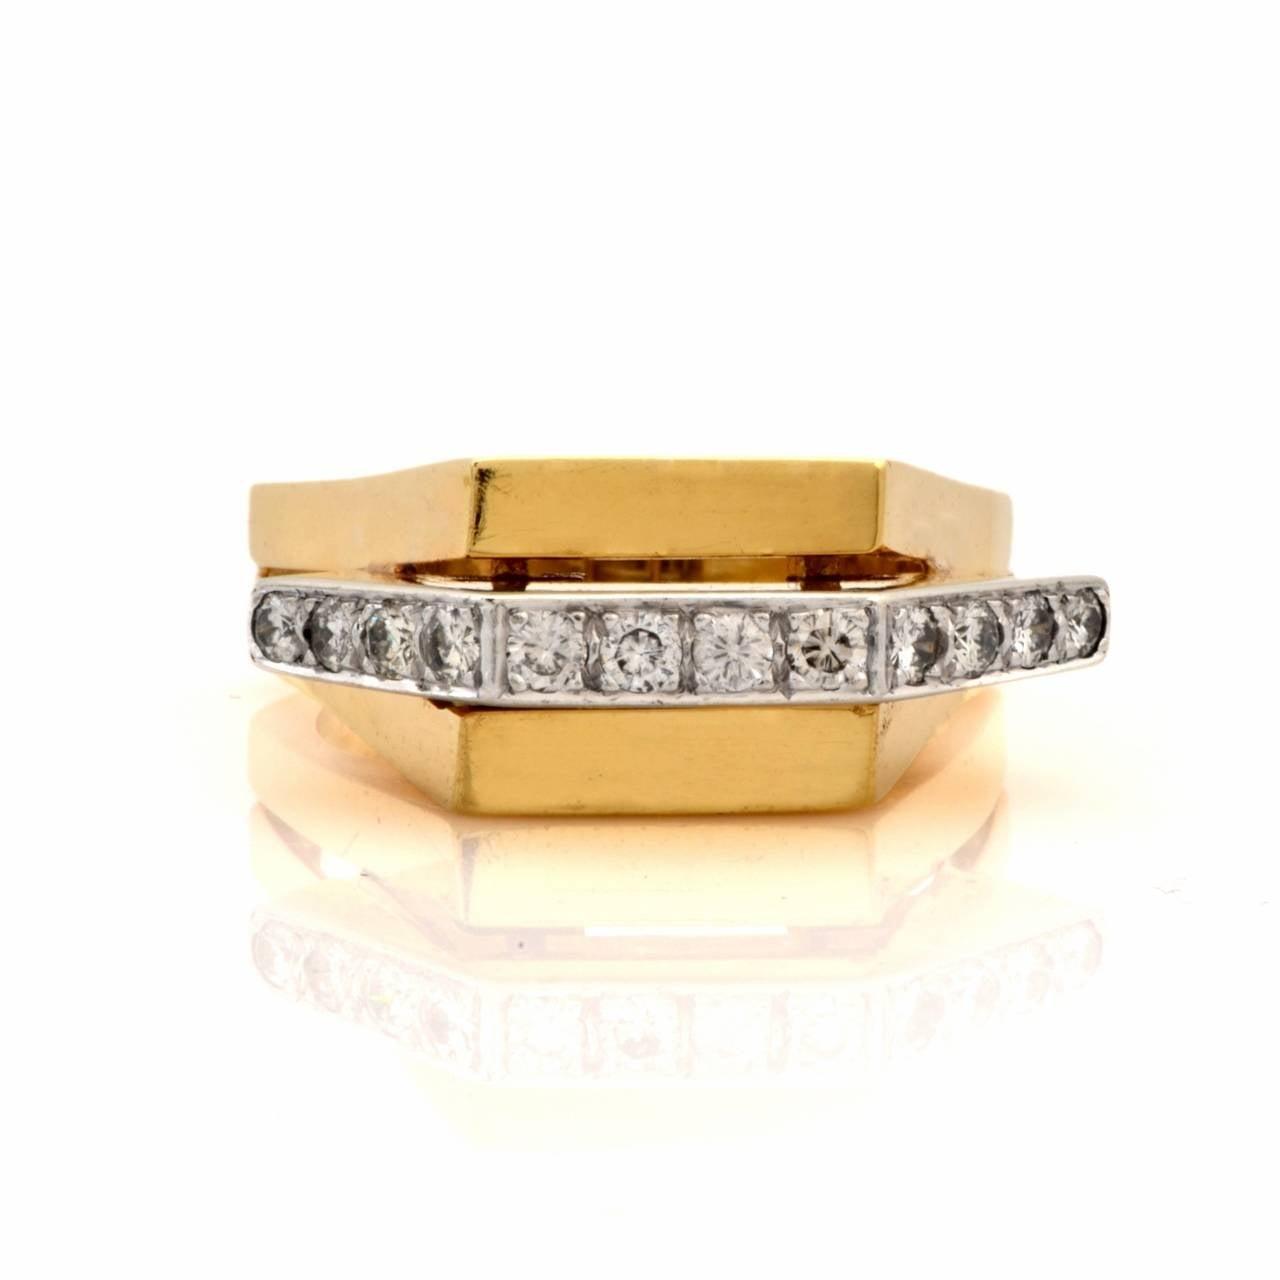 Retro Diamond Gold Geometric Pyramidal Design Ring 7